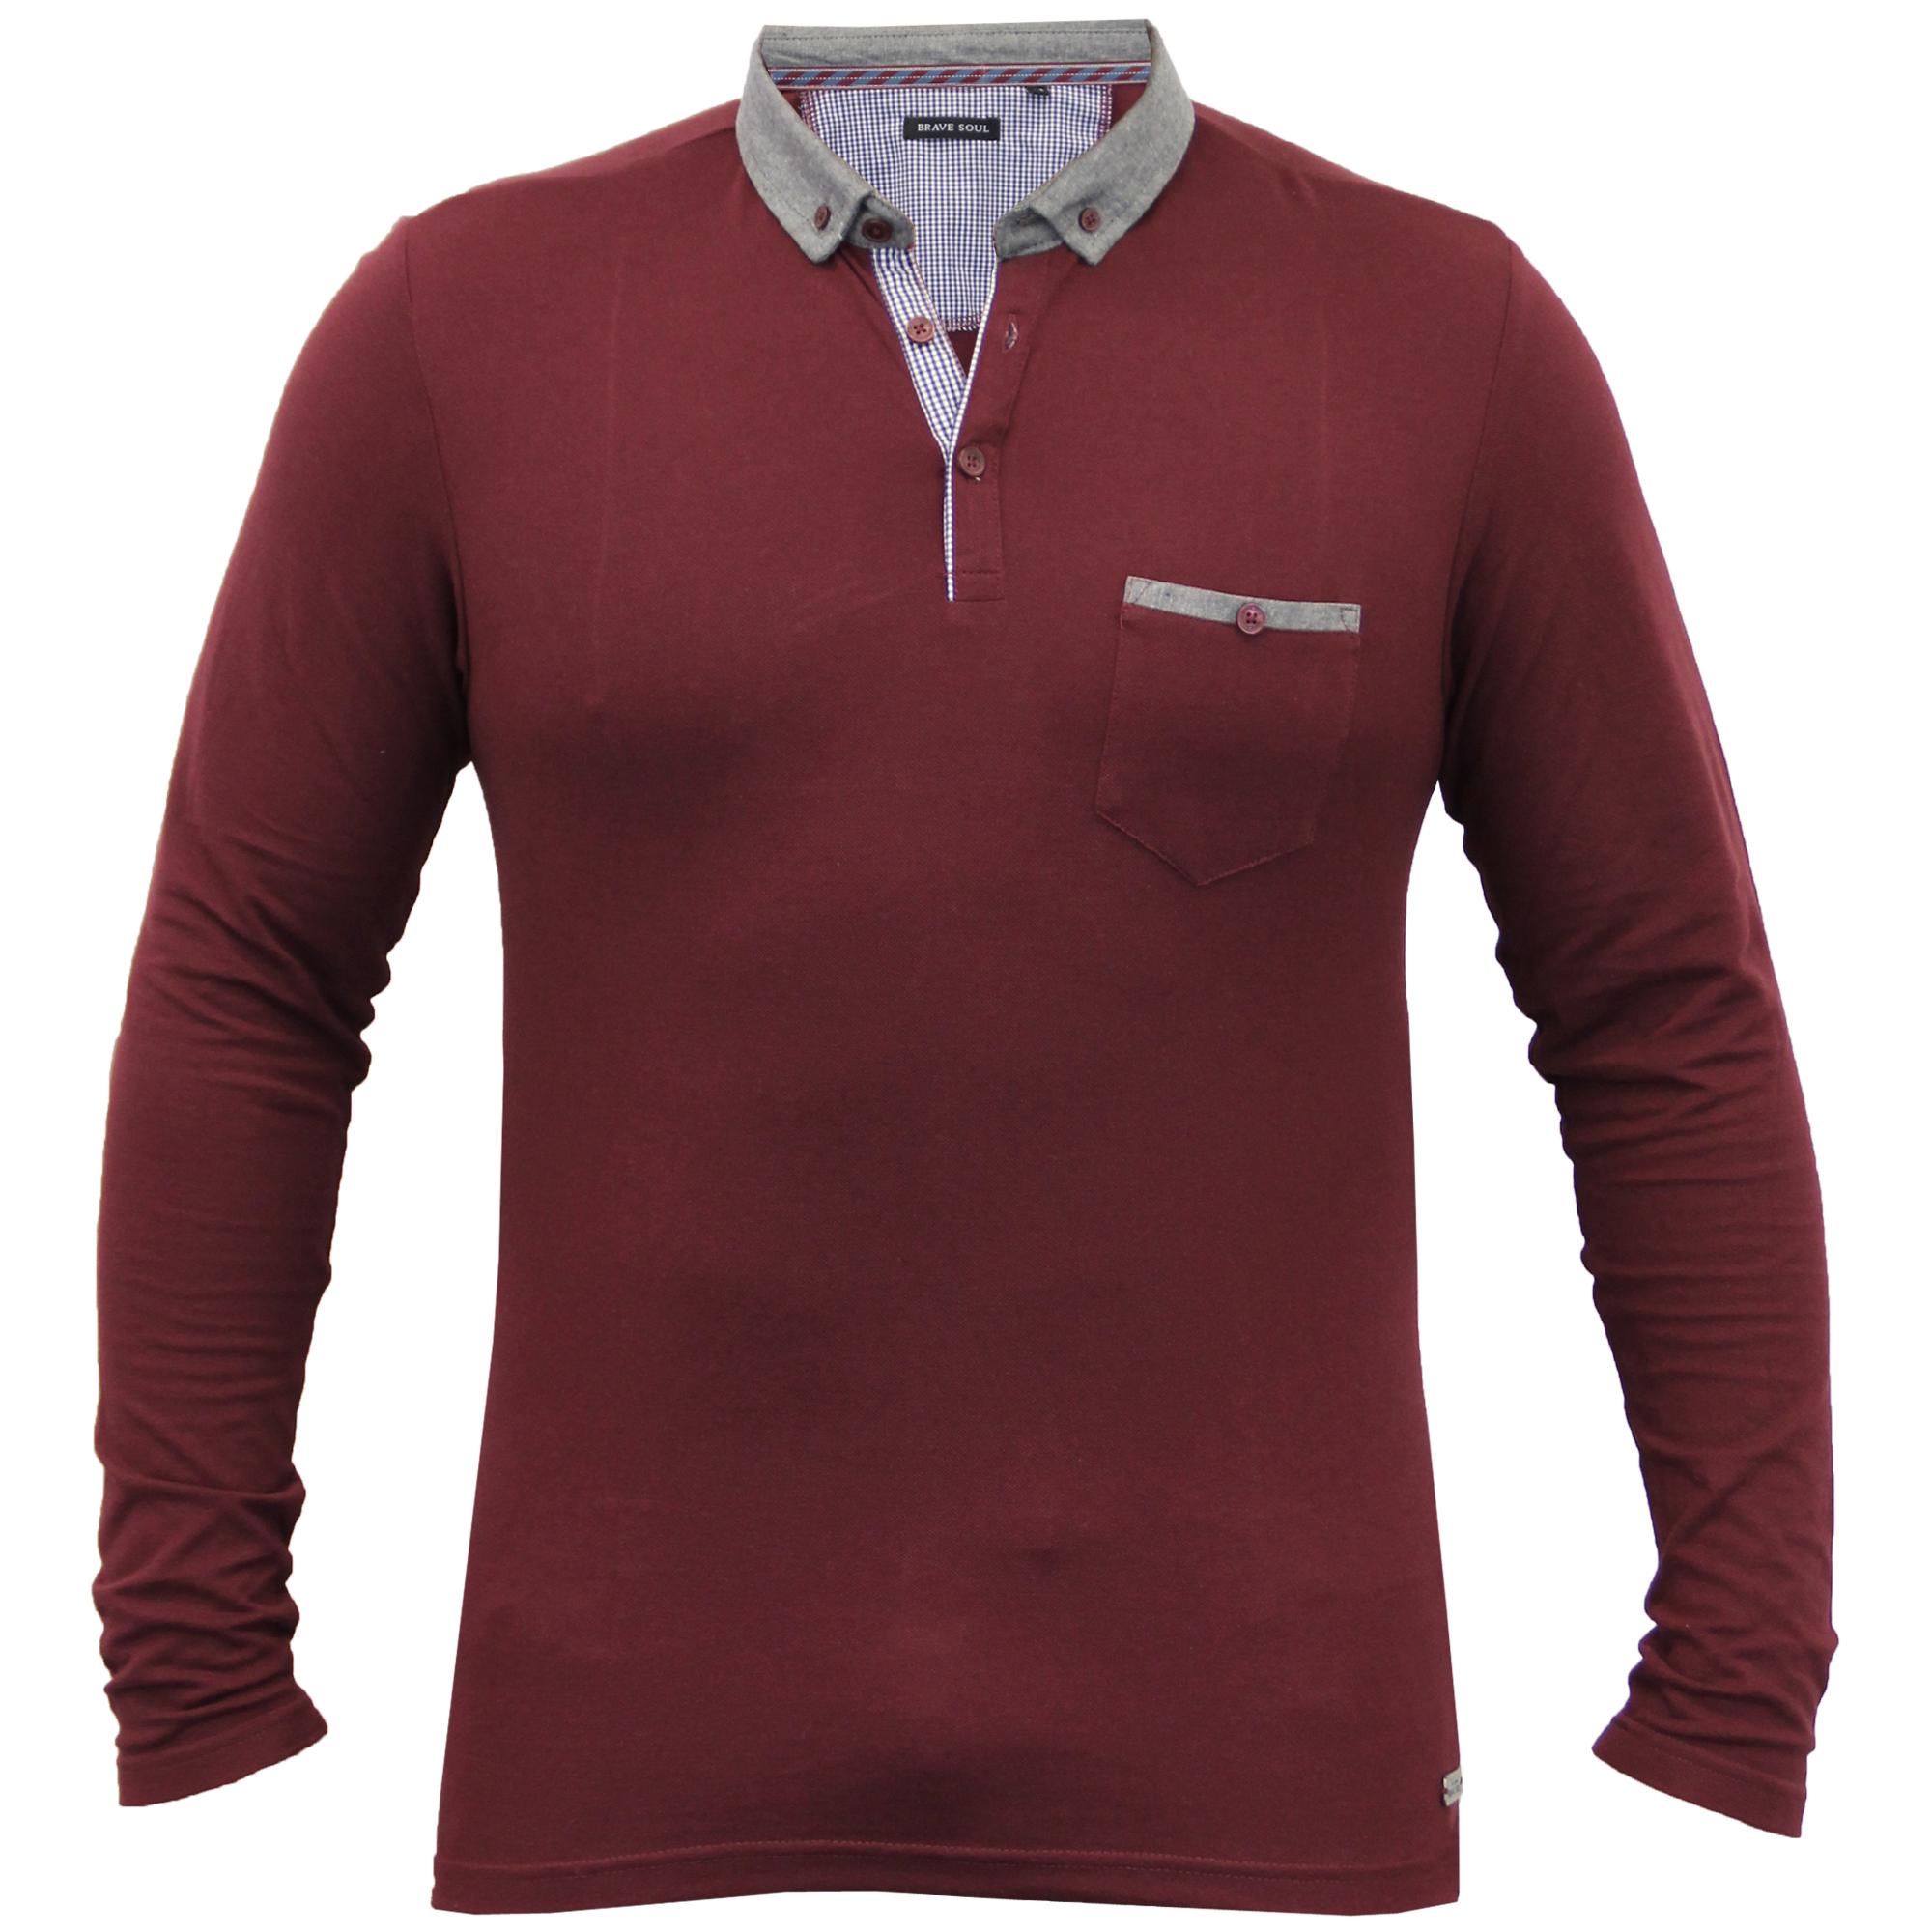 Homme-a-Manches-Longues-Jersey-Top-Brave-Soul-Pique-Polo-T-Shirt-A-Col-Ete-Neuf miniature 8